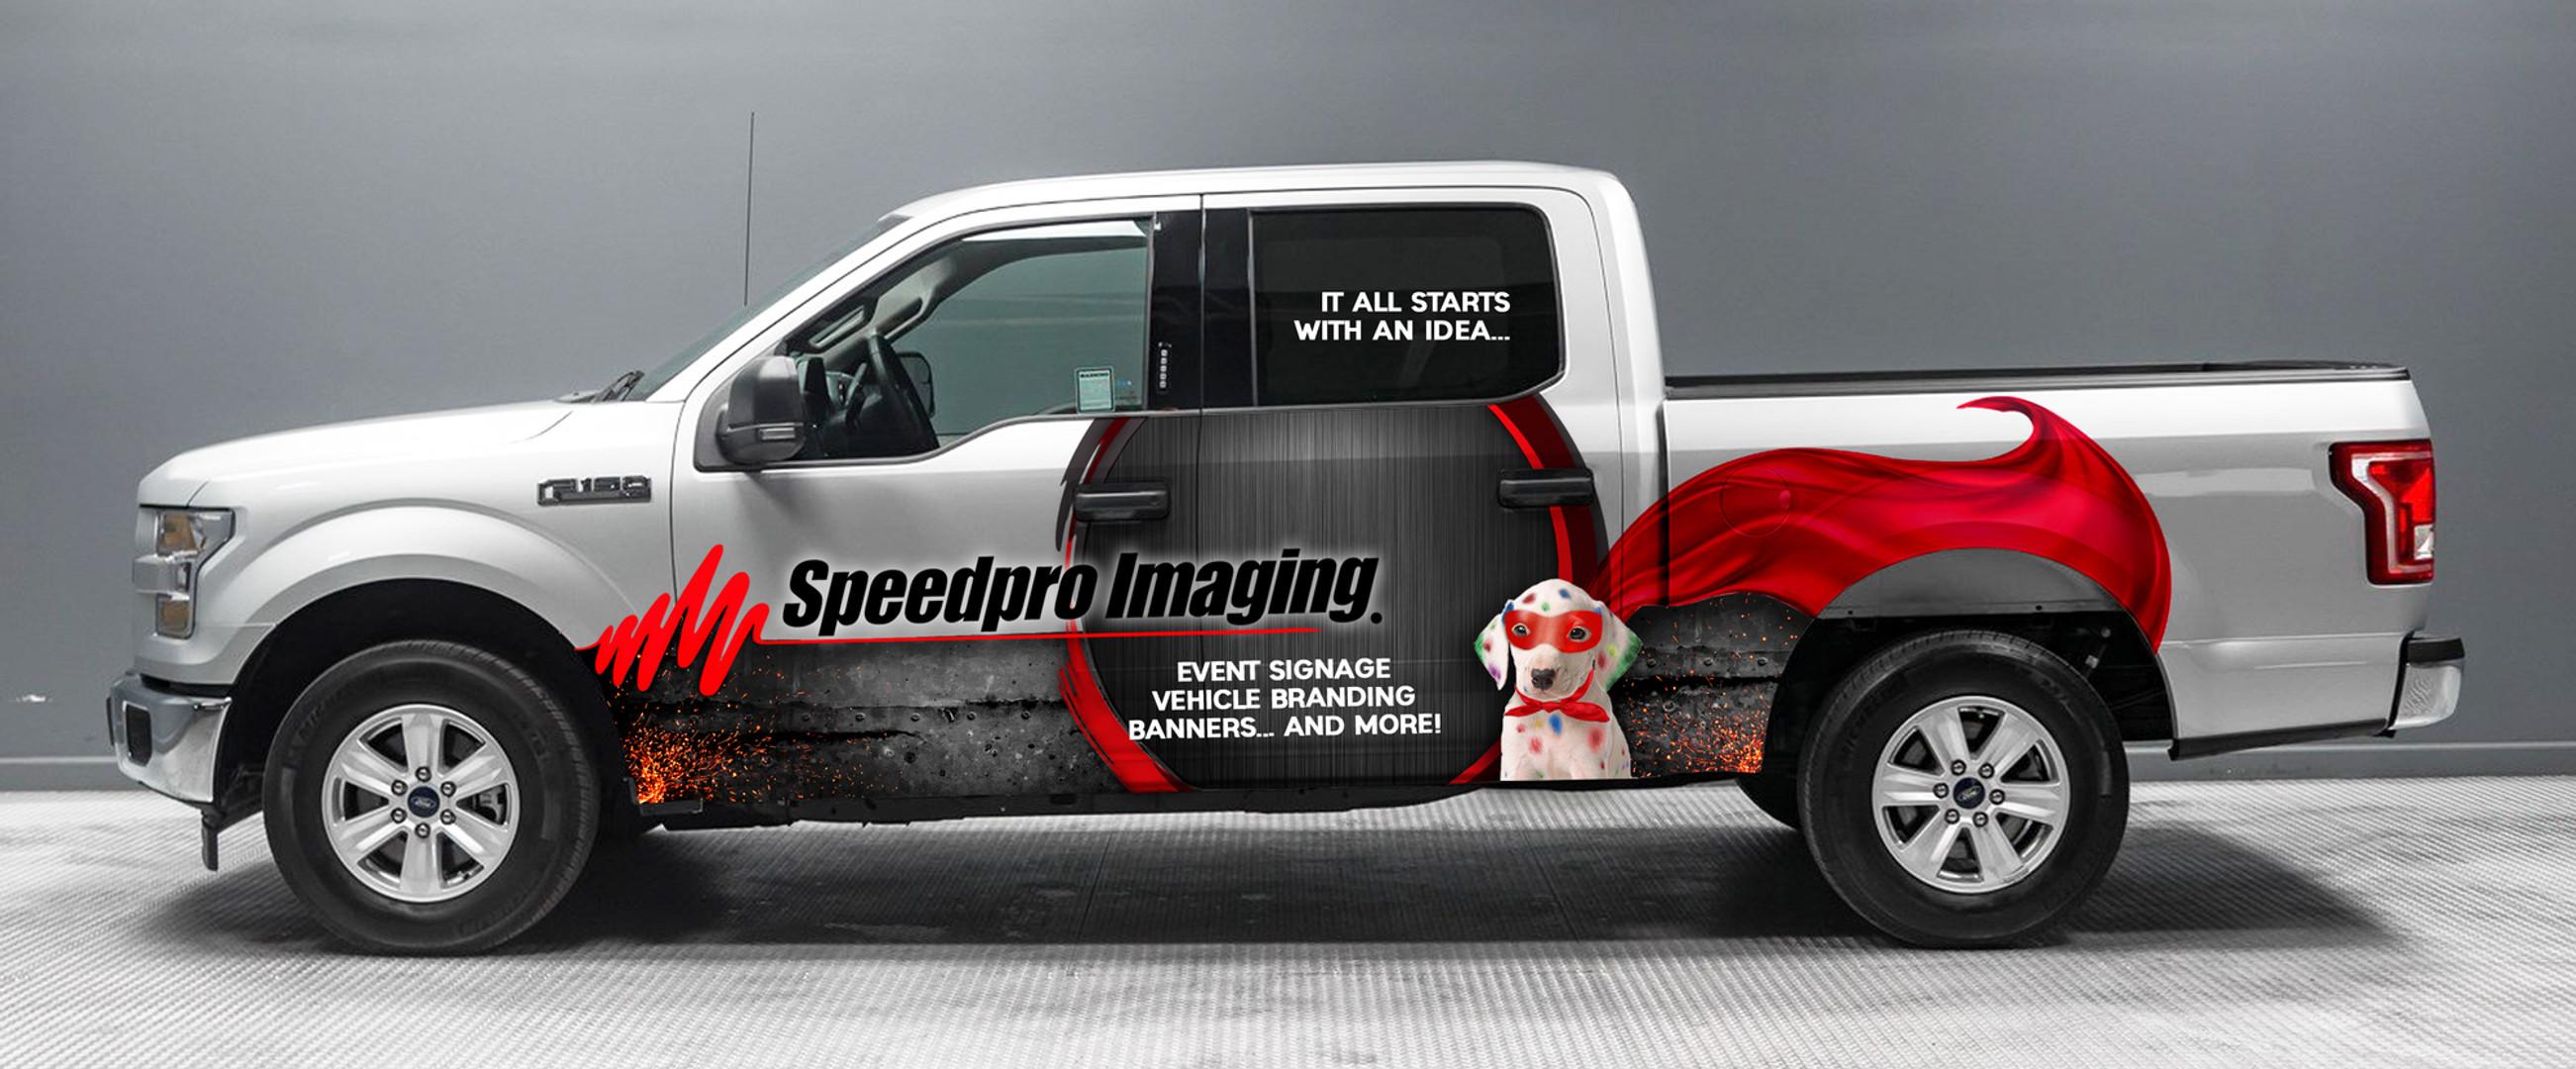 truck-driverside-halfwrap1.jpg